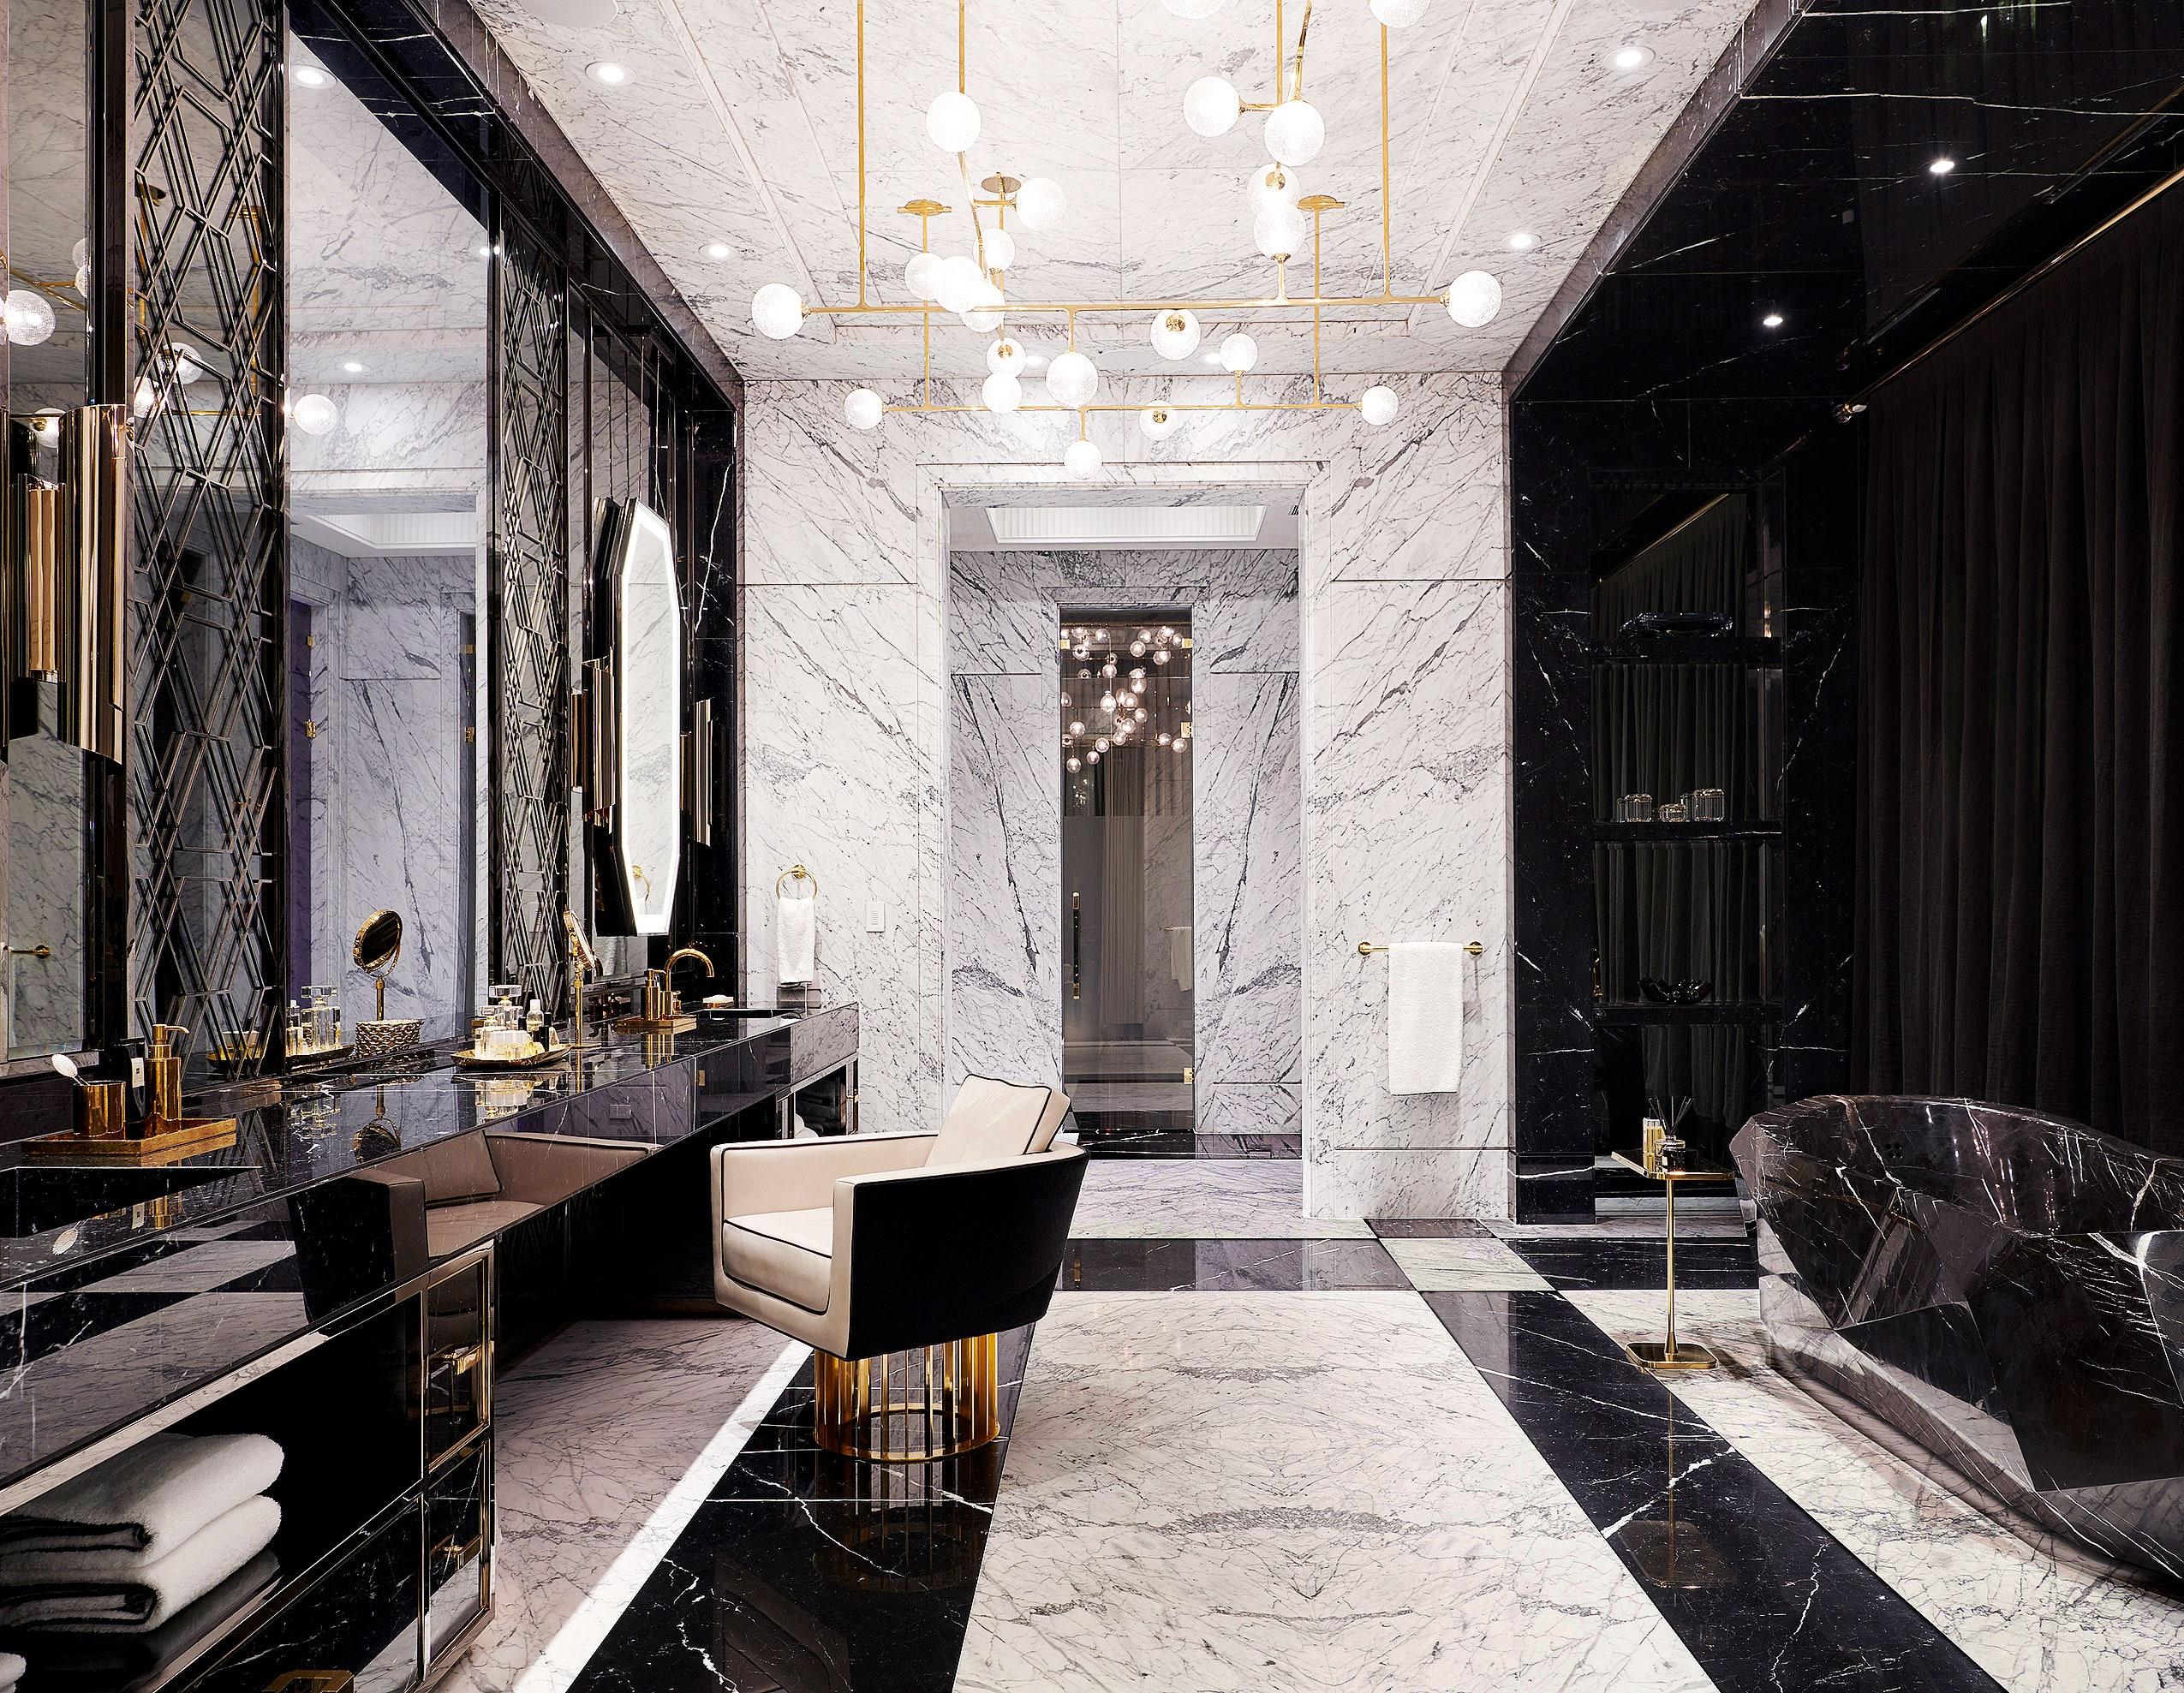 Inside Drake's Luxurious Toronto Home drake Inside Drake's Luxurious Toronto Home AD0520 DRAKE 13